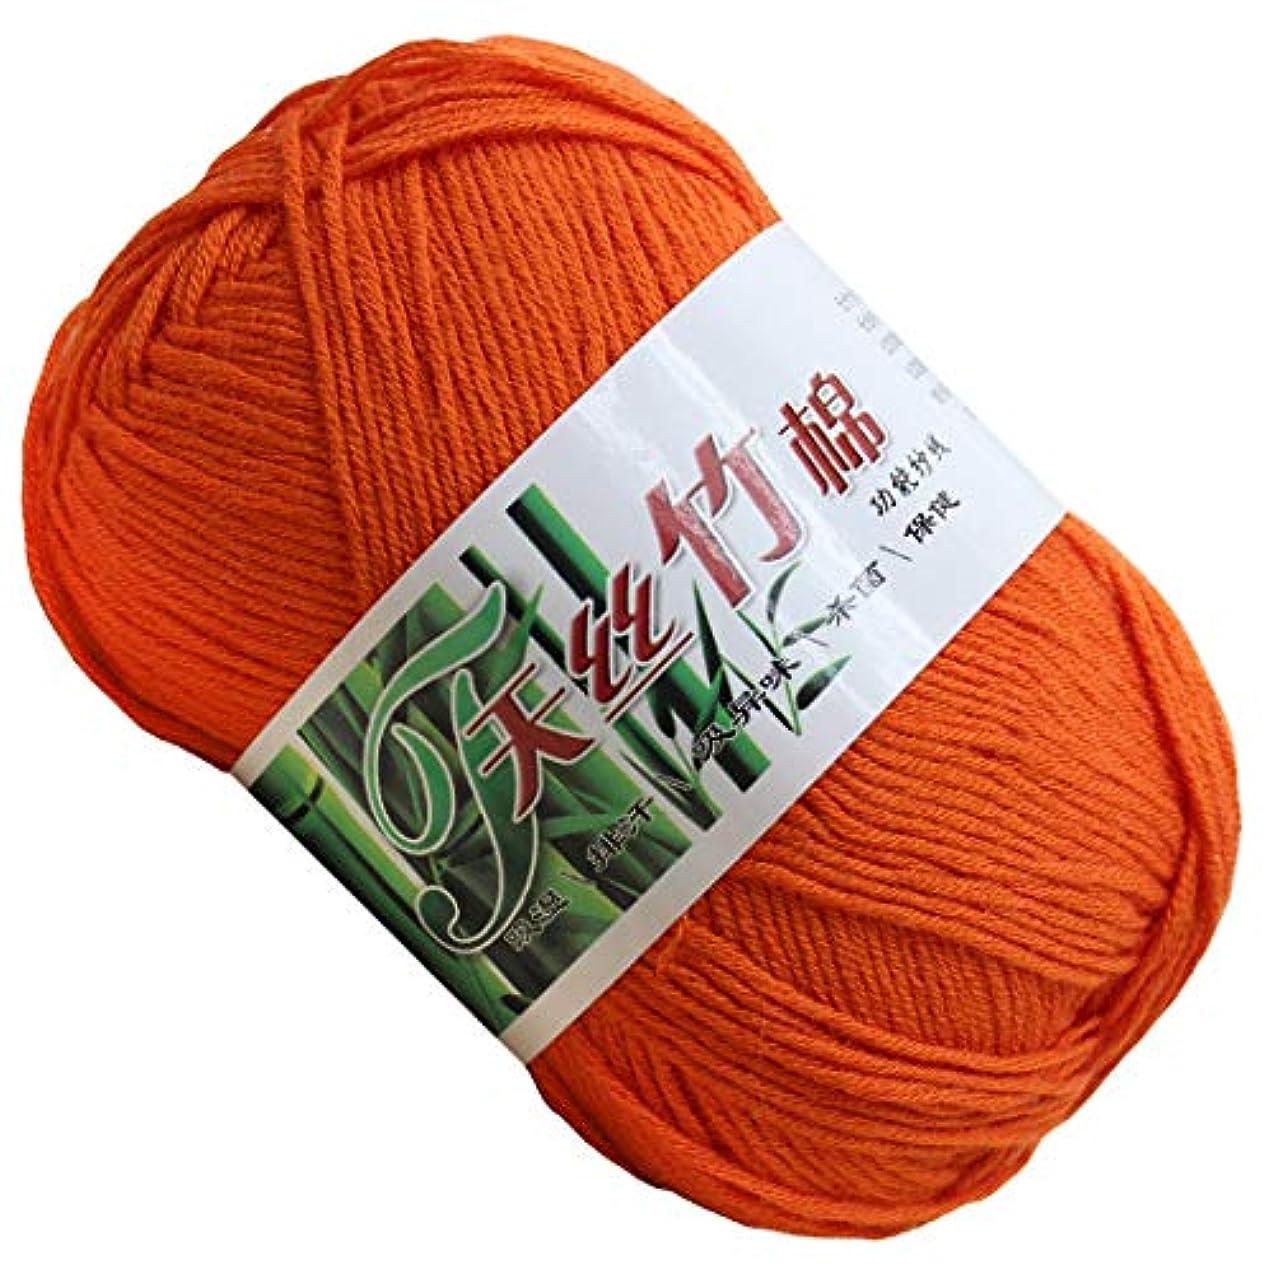 Set of 10 Skein Natural Select Soft Tencel Yarn 70% Bamboo + 30% Egyptian Cotton Crochet 50g Baby Knit Wool Yarn (Orange 9020)